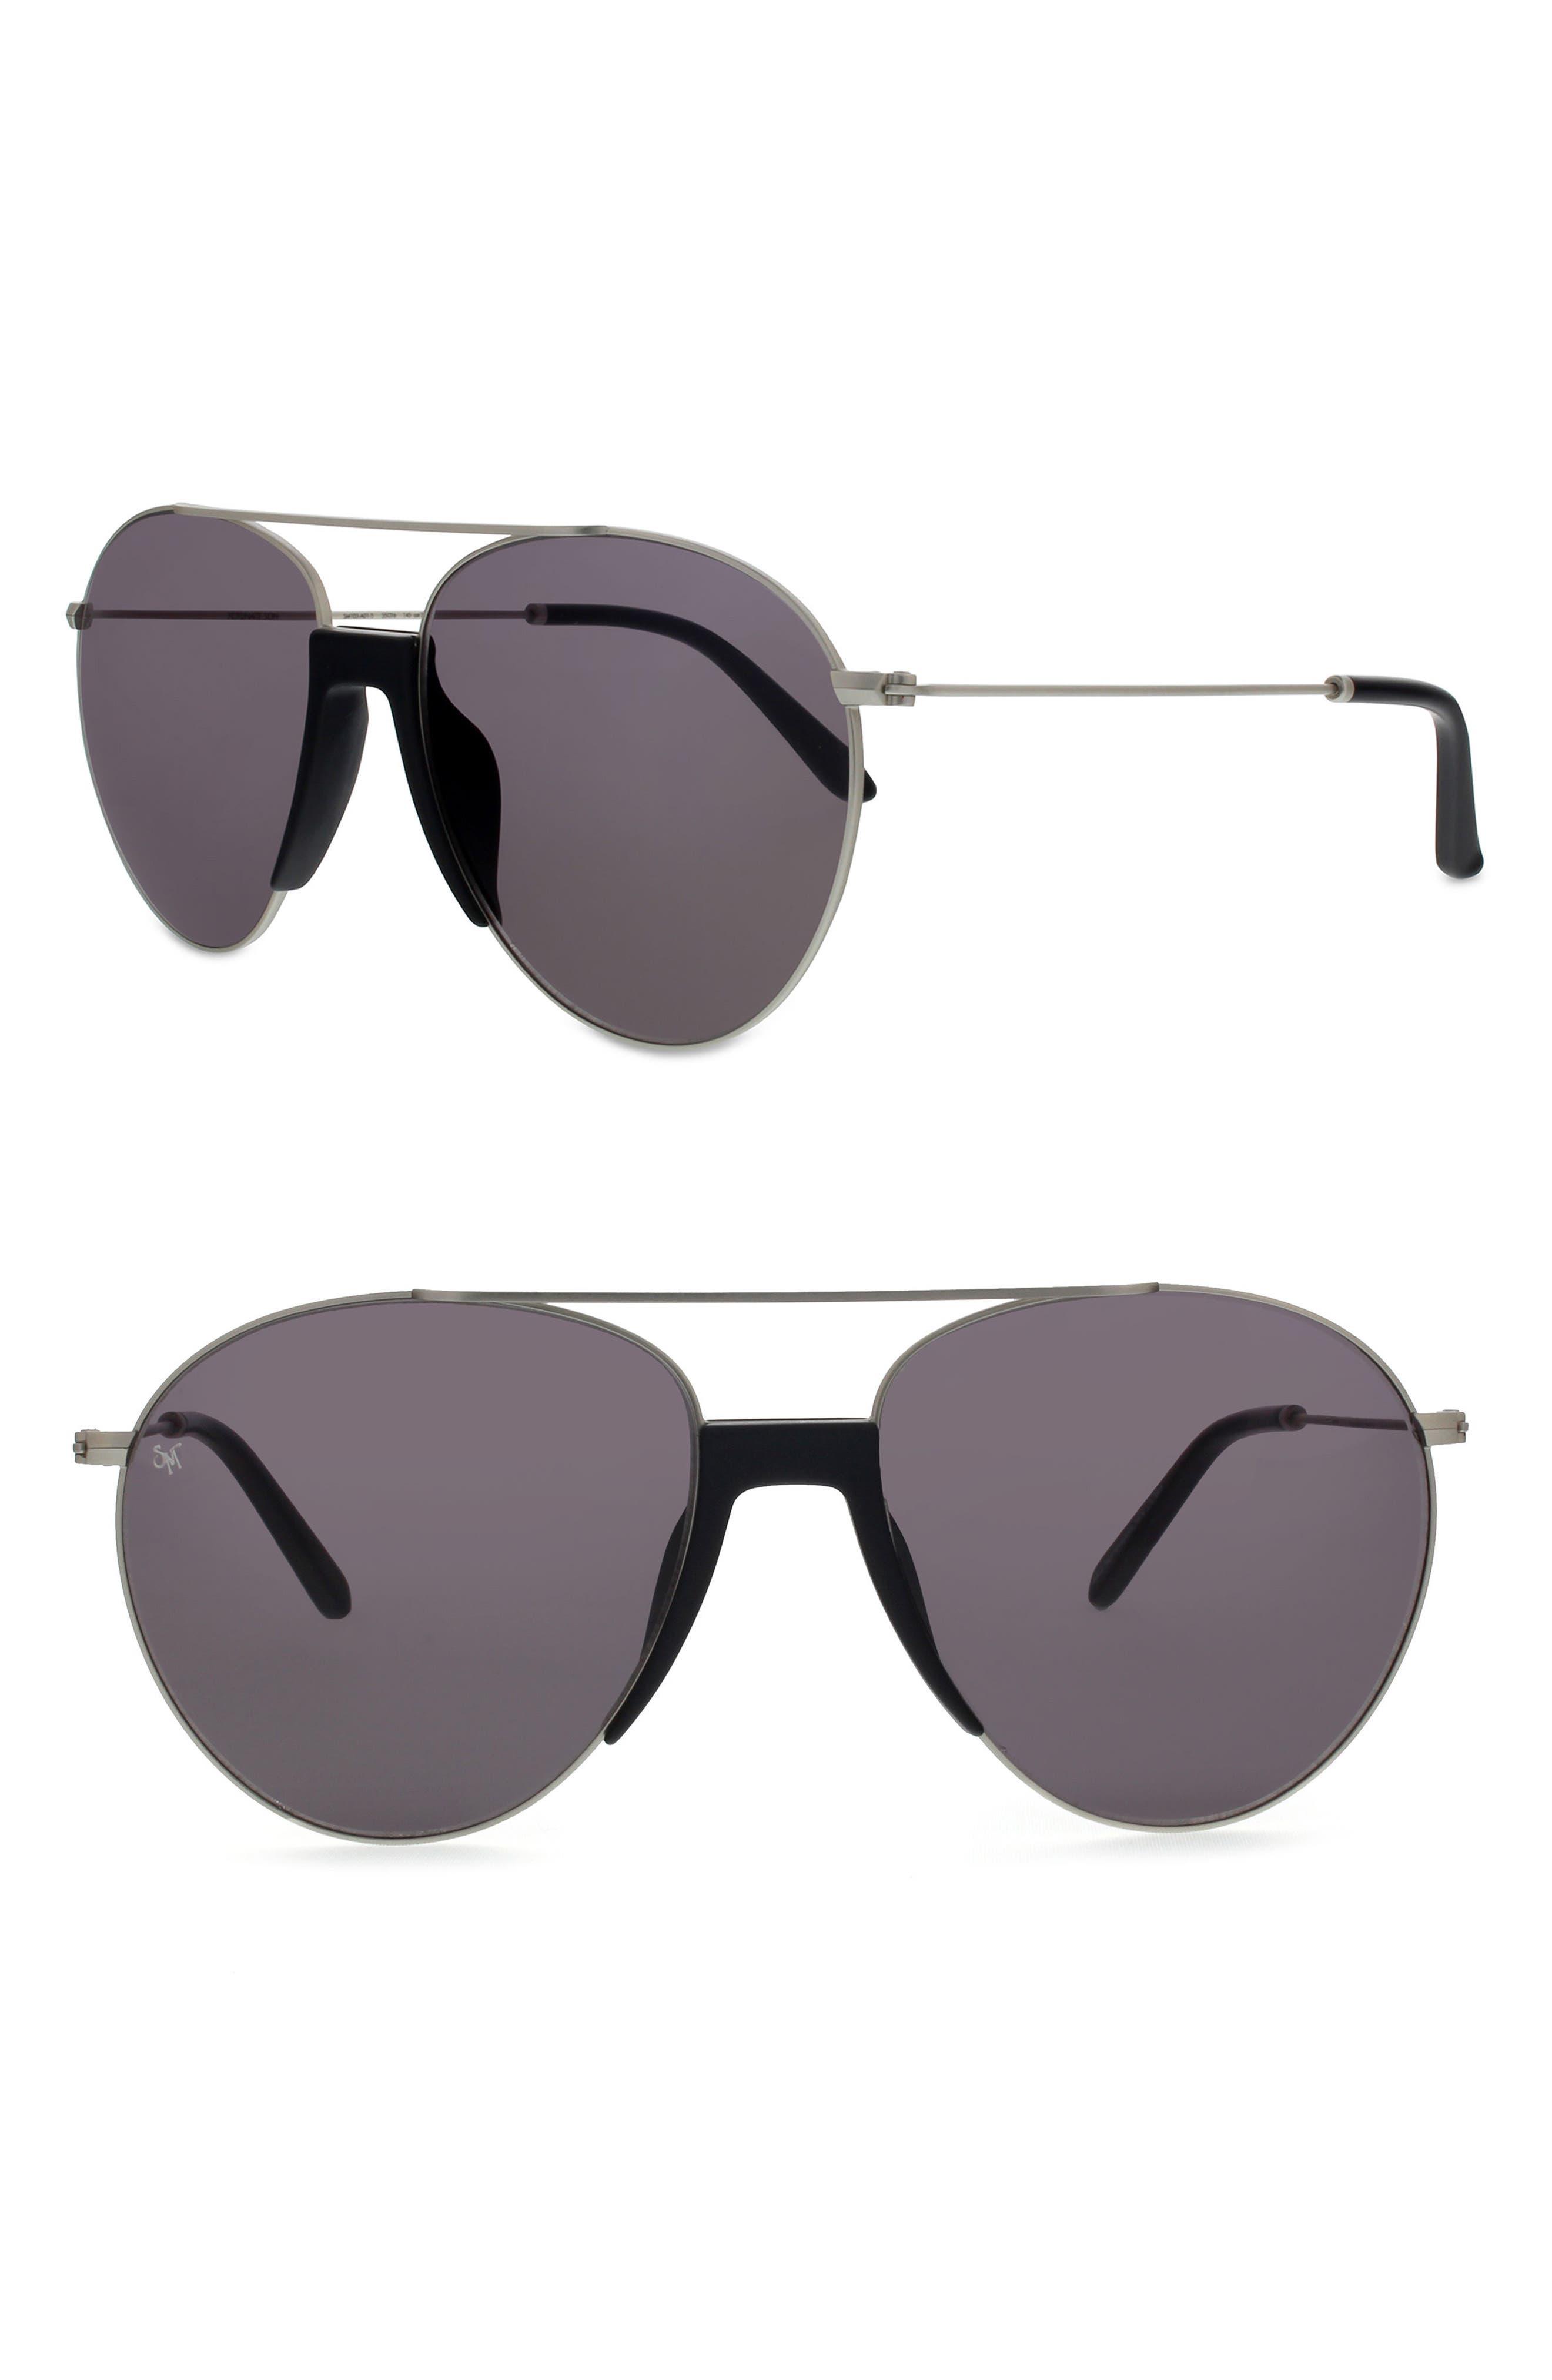 Fortunate Son 55mm Aviator Sunglasses,                             Main thumbnail 1, color,                             MATTE BLACK/ MATTE SILVER